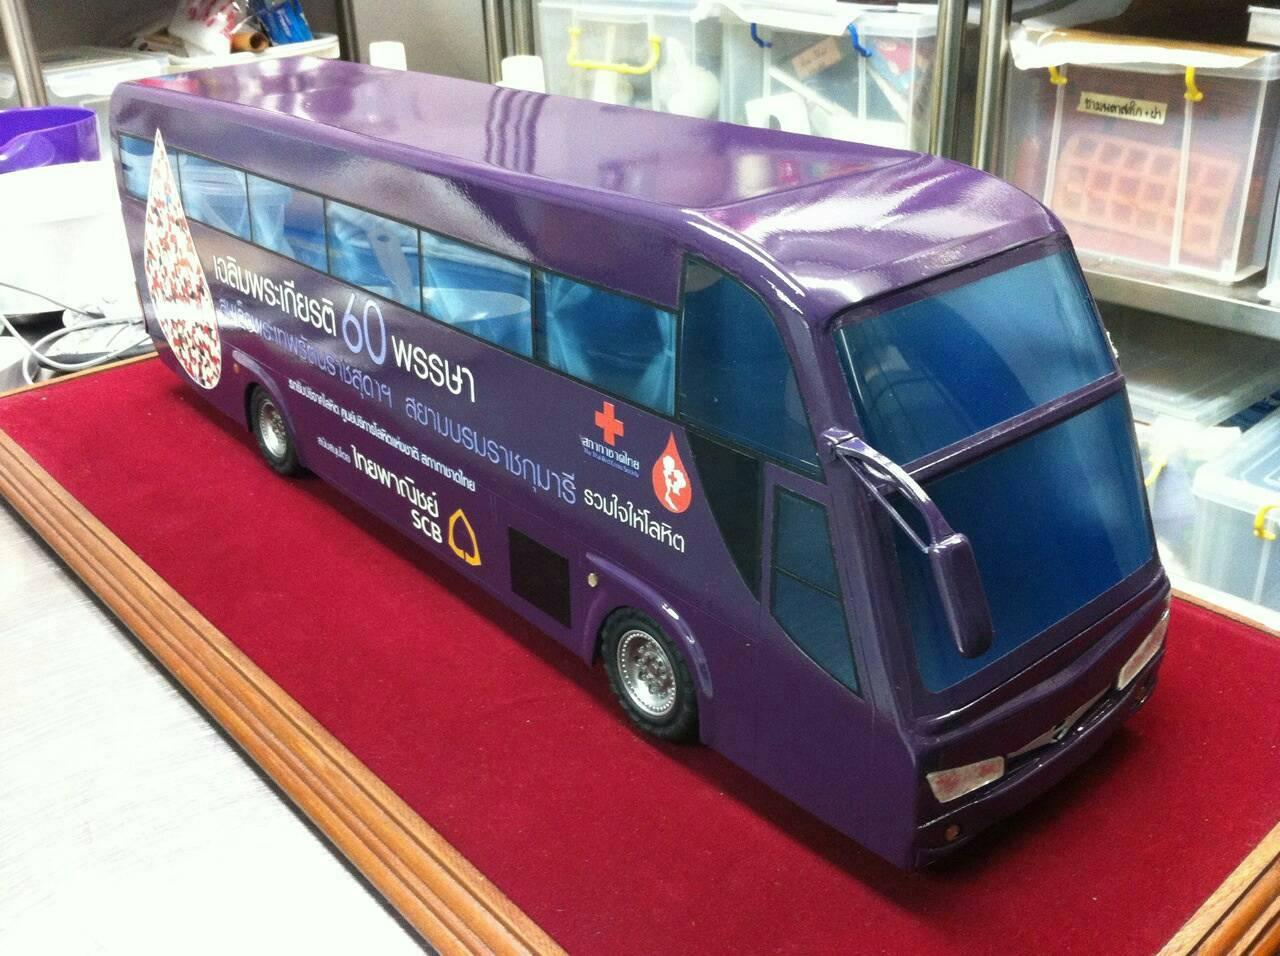 3D Print รถบริจาคโลหิต สภากาชาดไทย mini